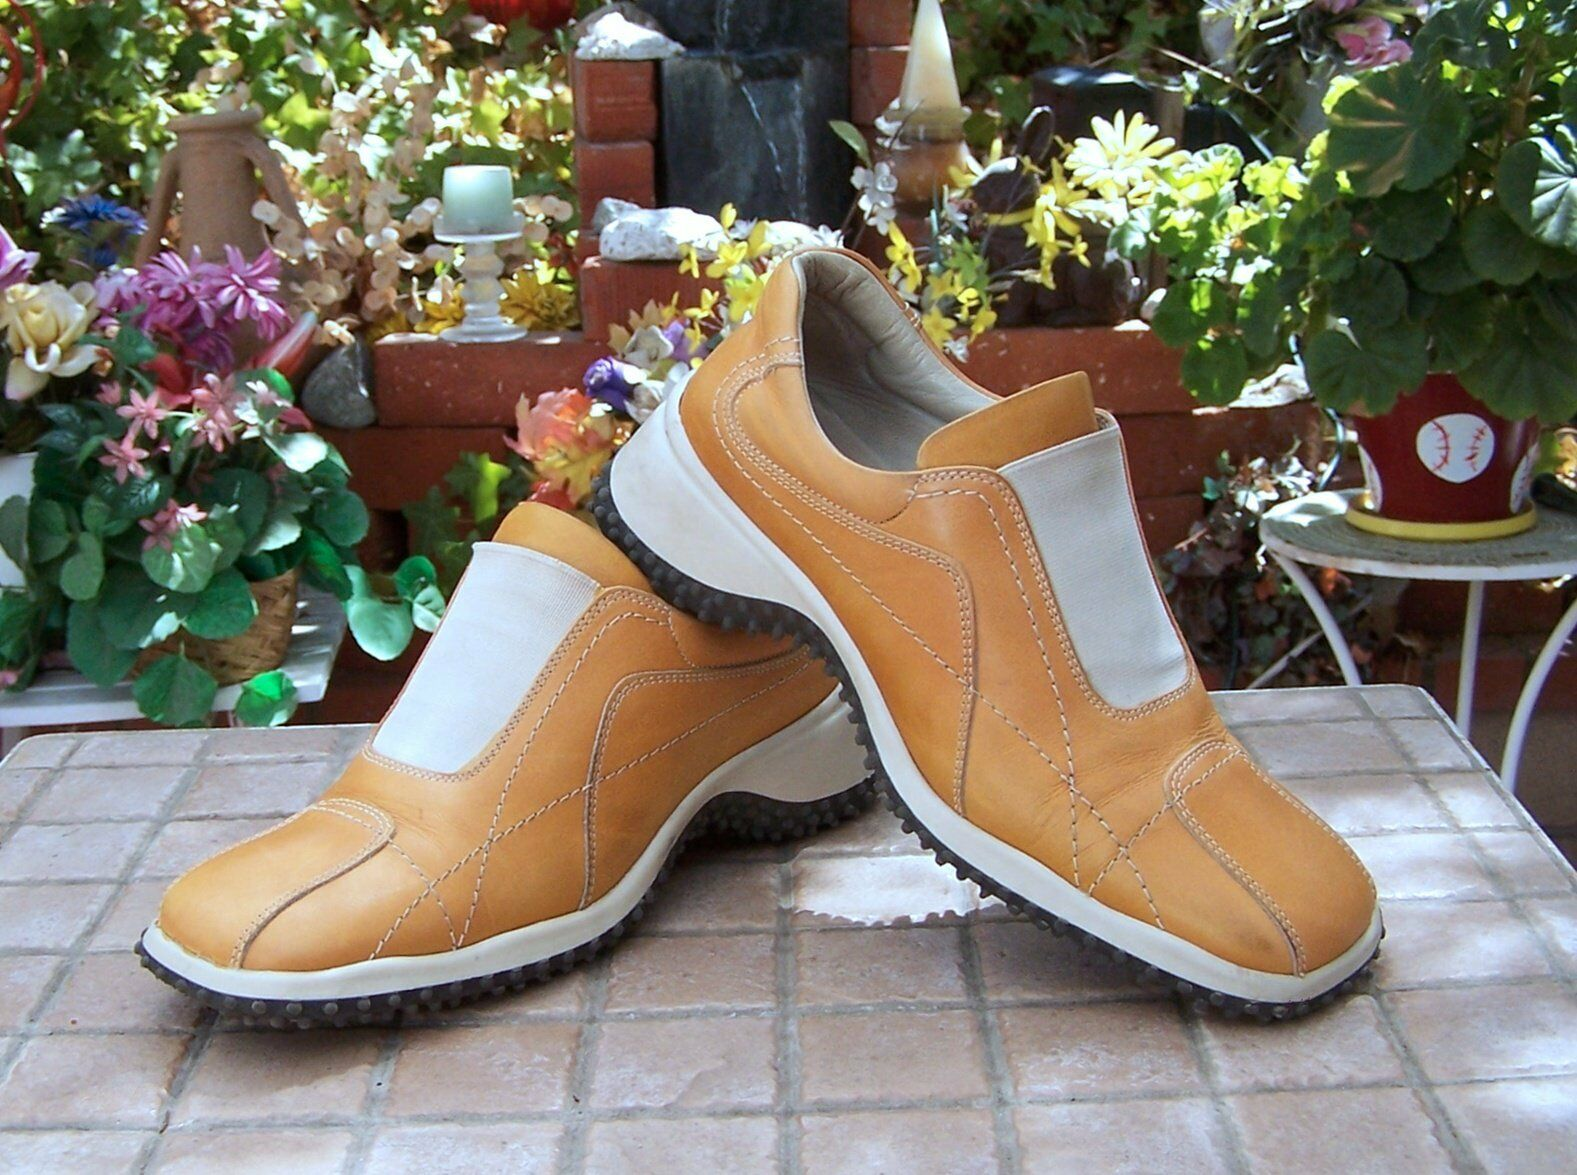 Women's shoes TRIVER FLIGHT  US 6 (EU 36) Tan Leather. NICE